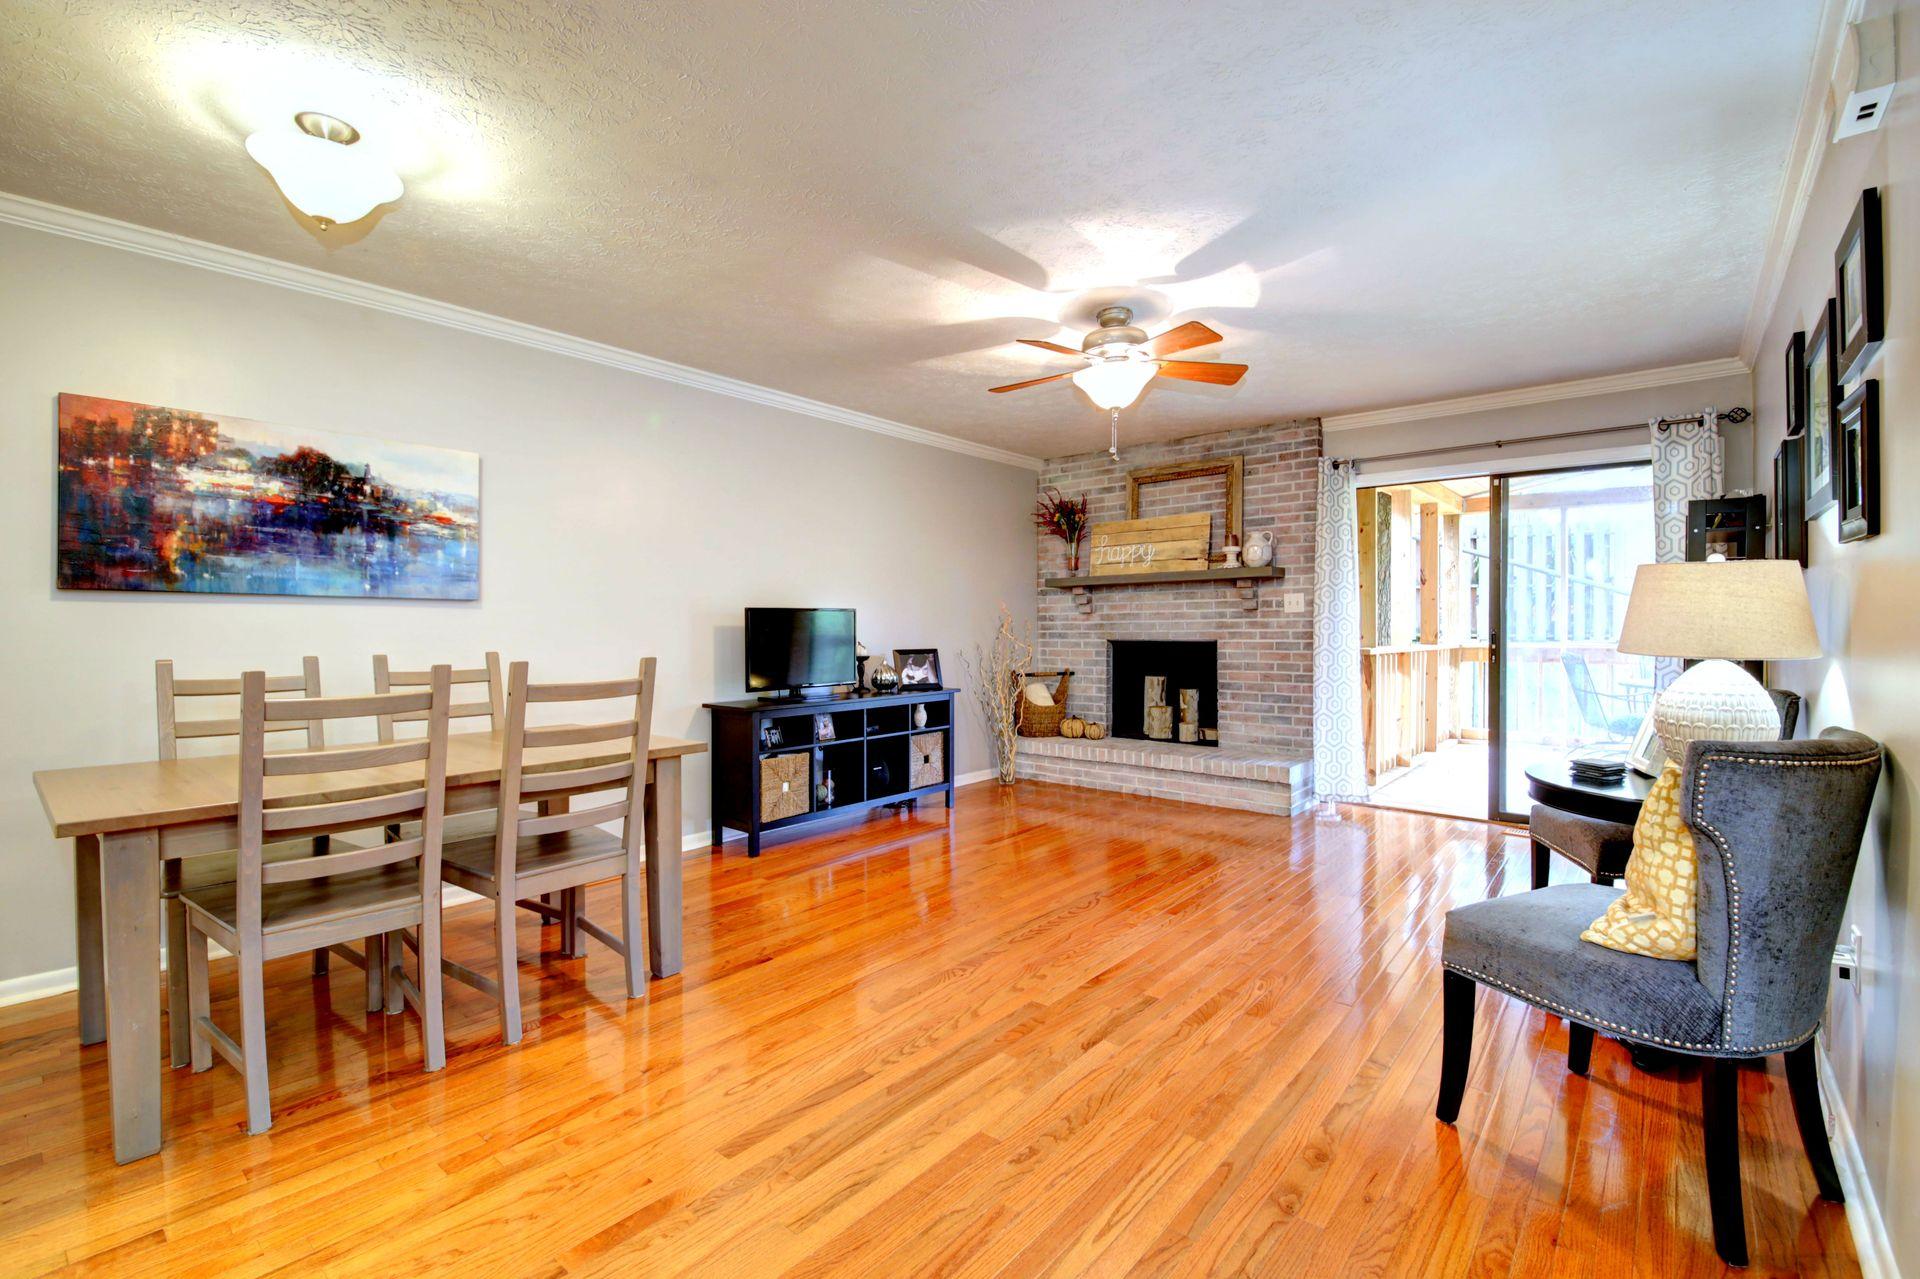 430 Mckinley Ave Charleston Wv 25314 Real Estate Tour